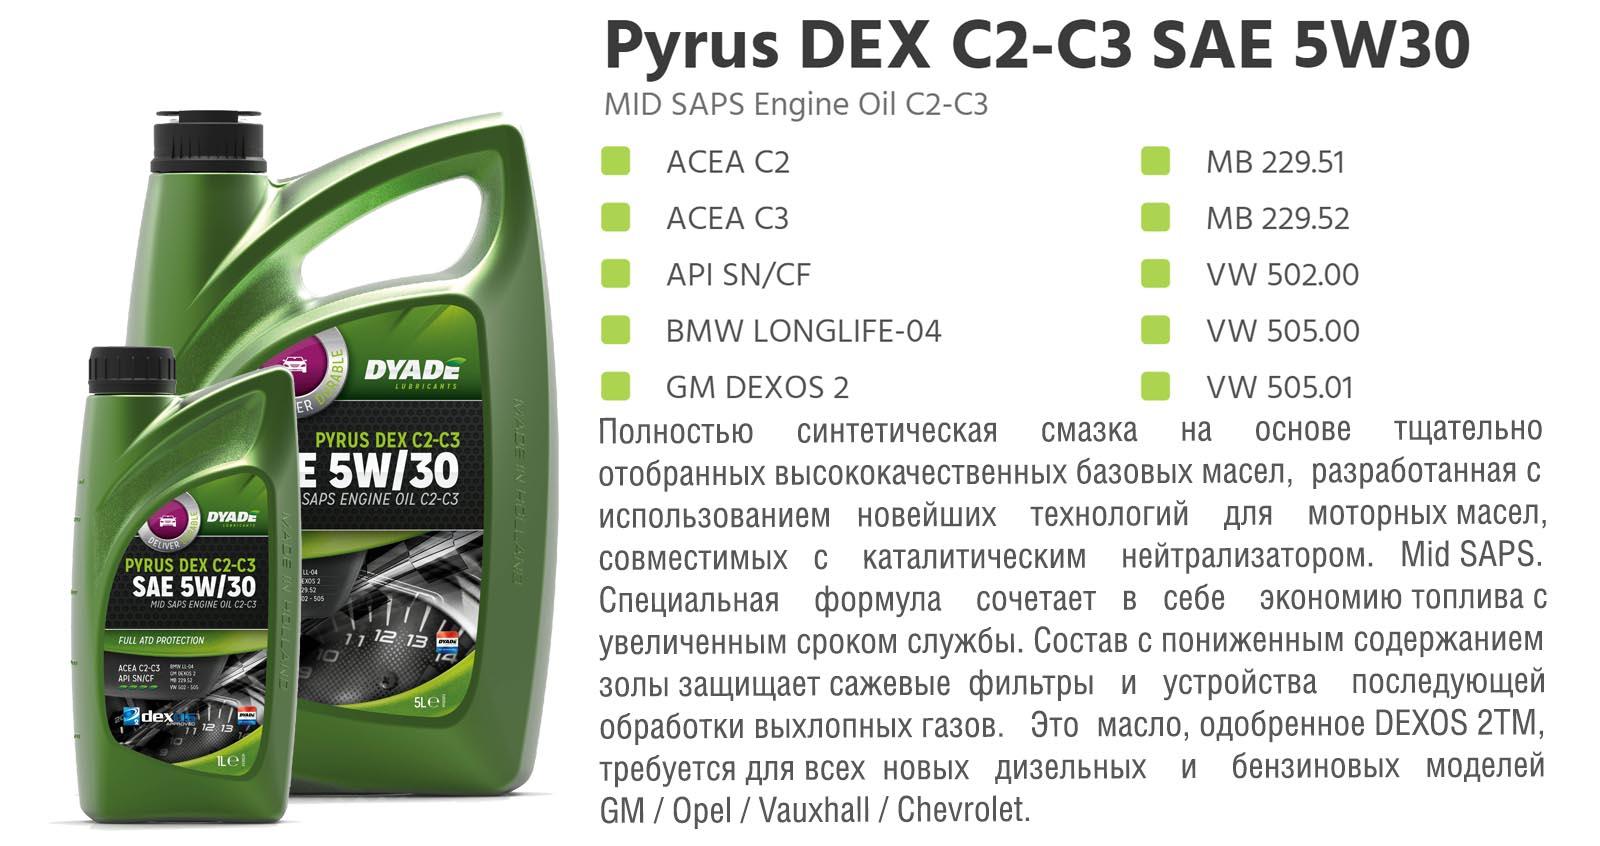 Масло моторное Pyrus DEX C2-C3 SAE 5W30 (1L) 574266 dyadelubricants